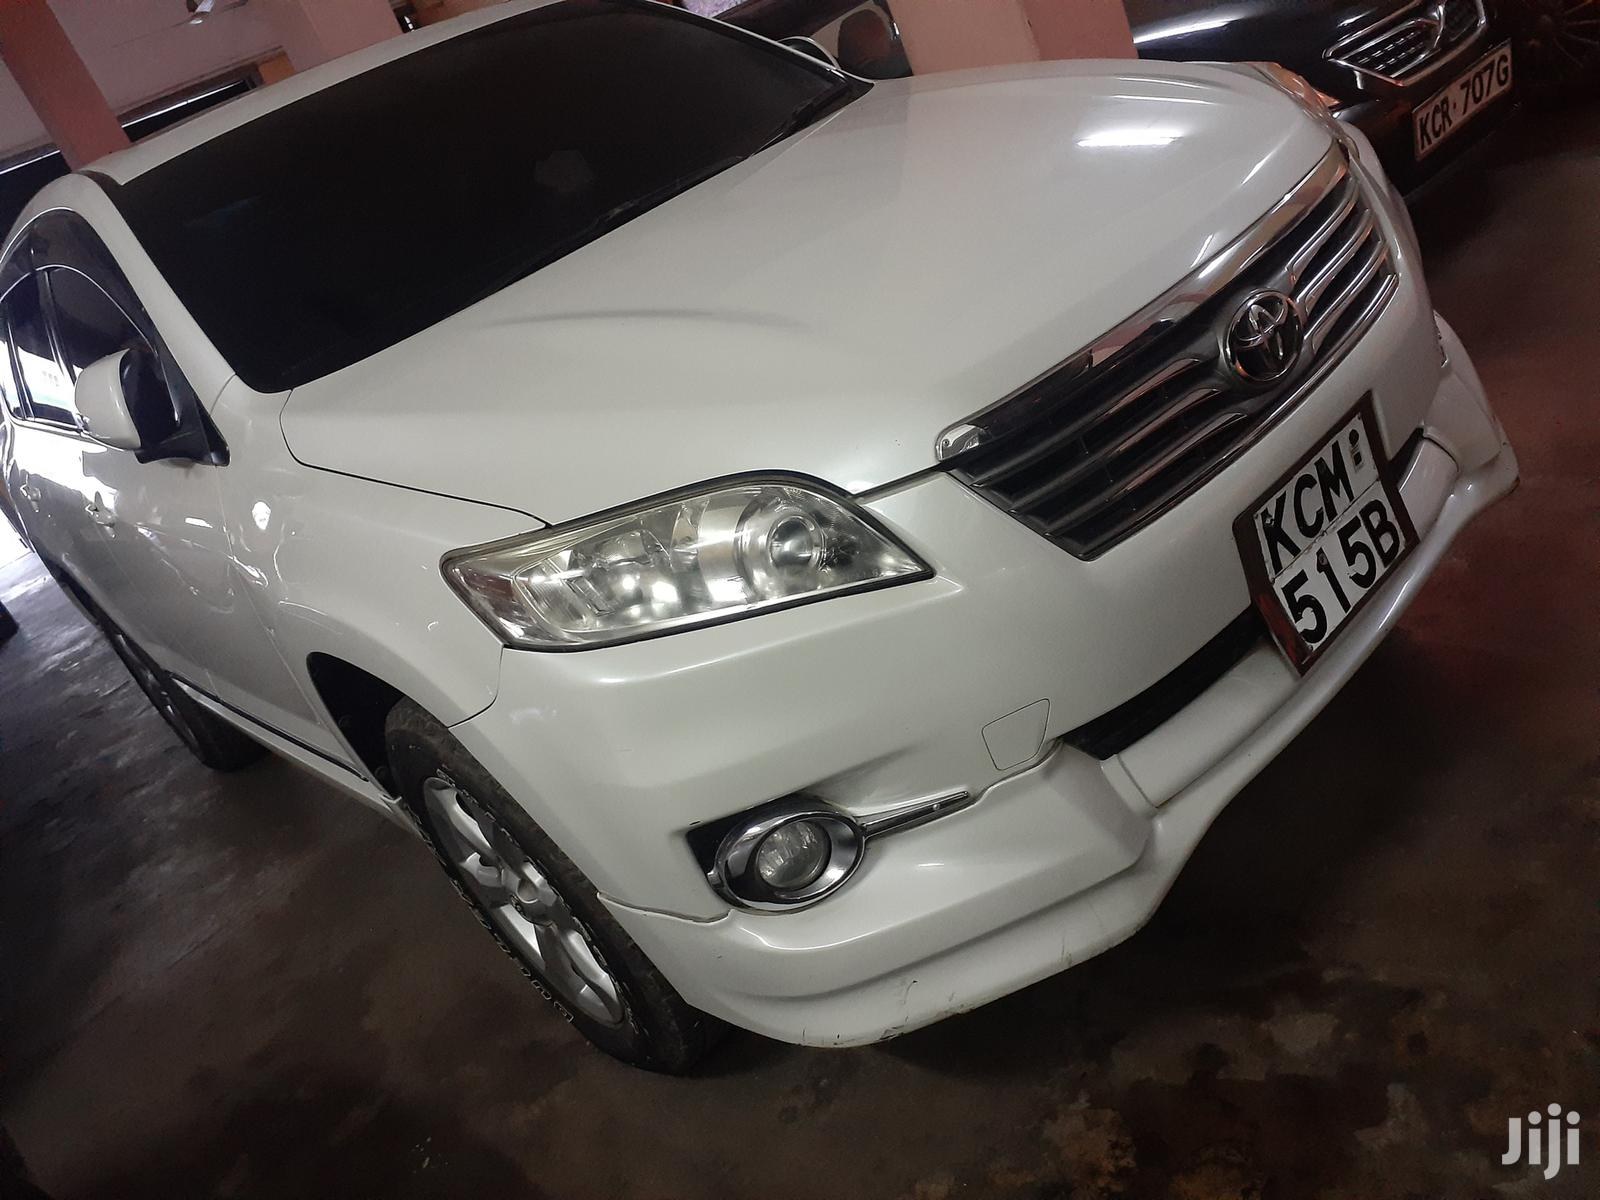 Toyota Vanguard 2010 White | Cars for sale in Mvita, Mombasa, Kenya